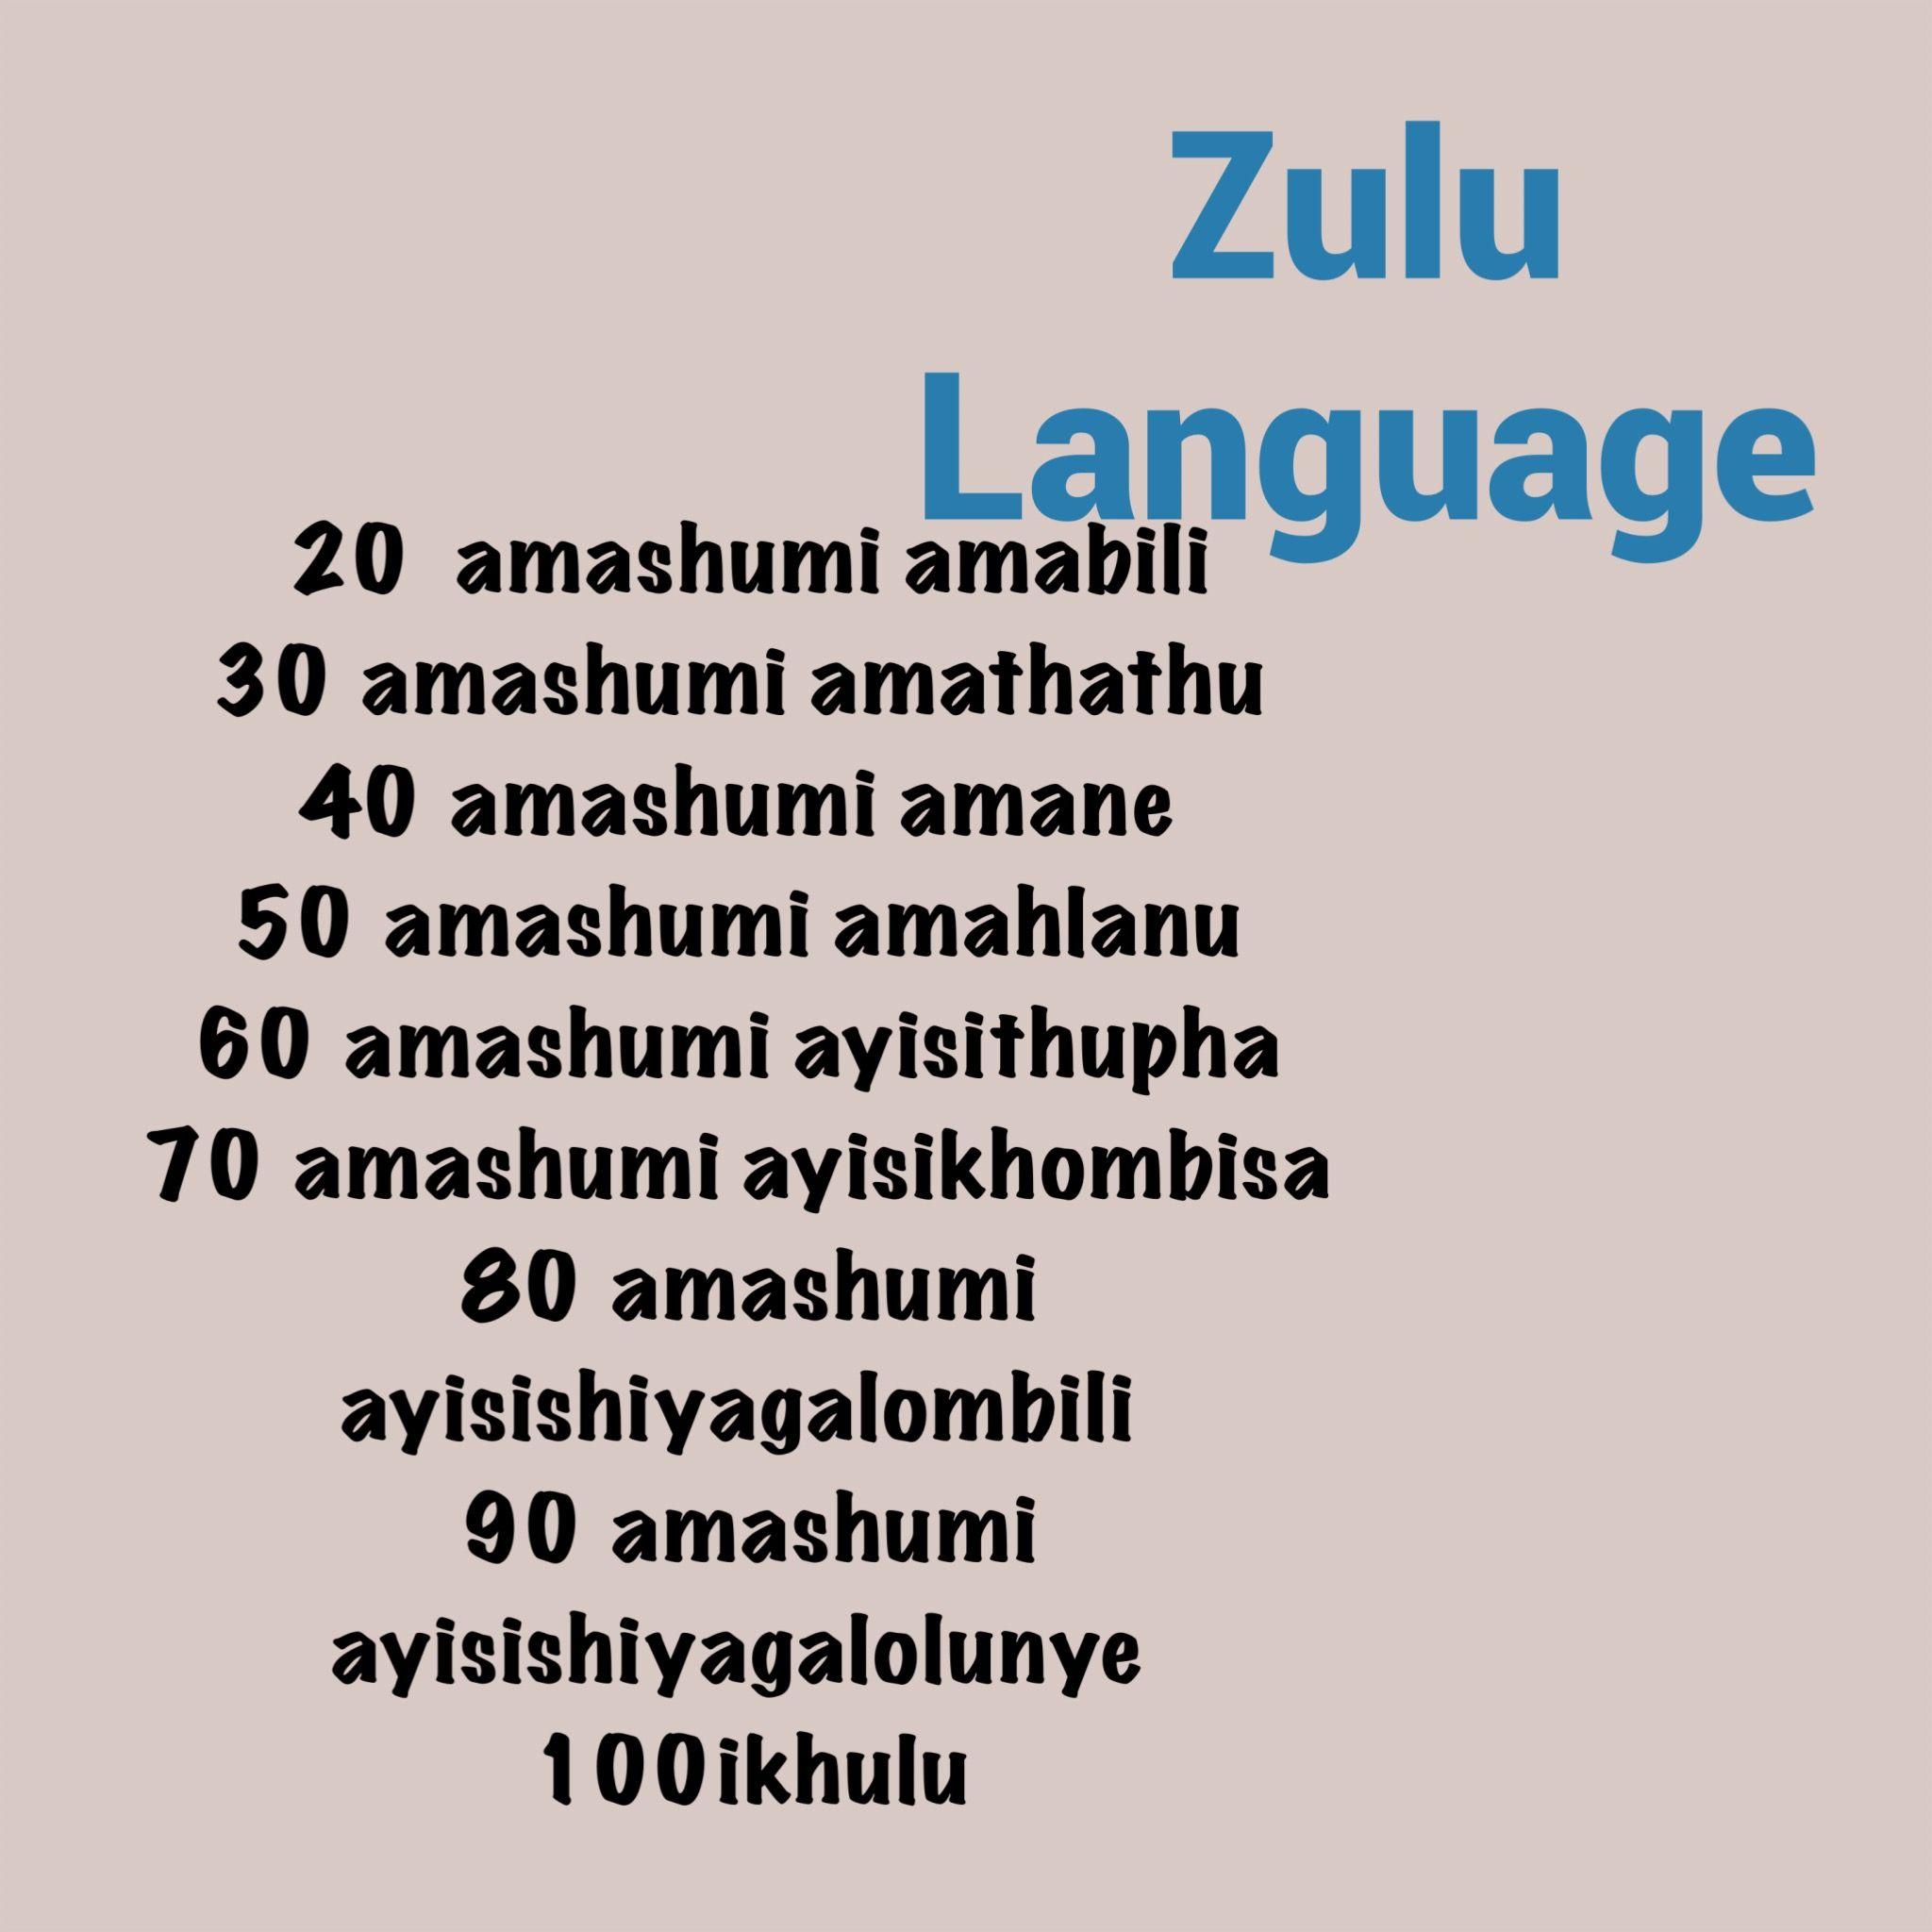 Pin On Numbers In Bantu Languages